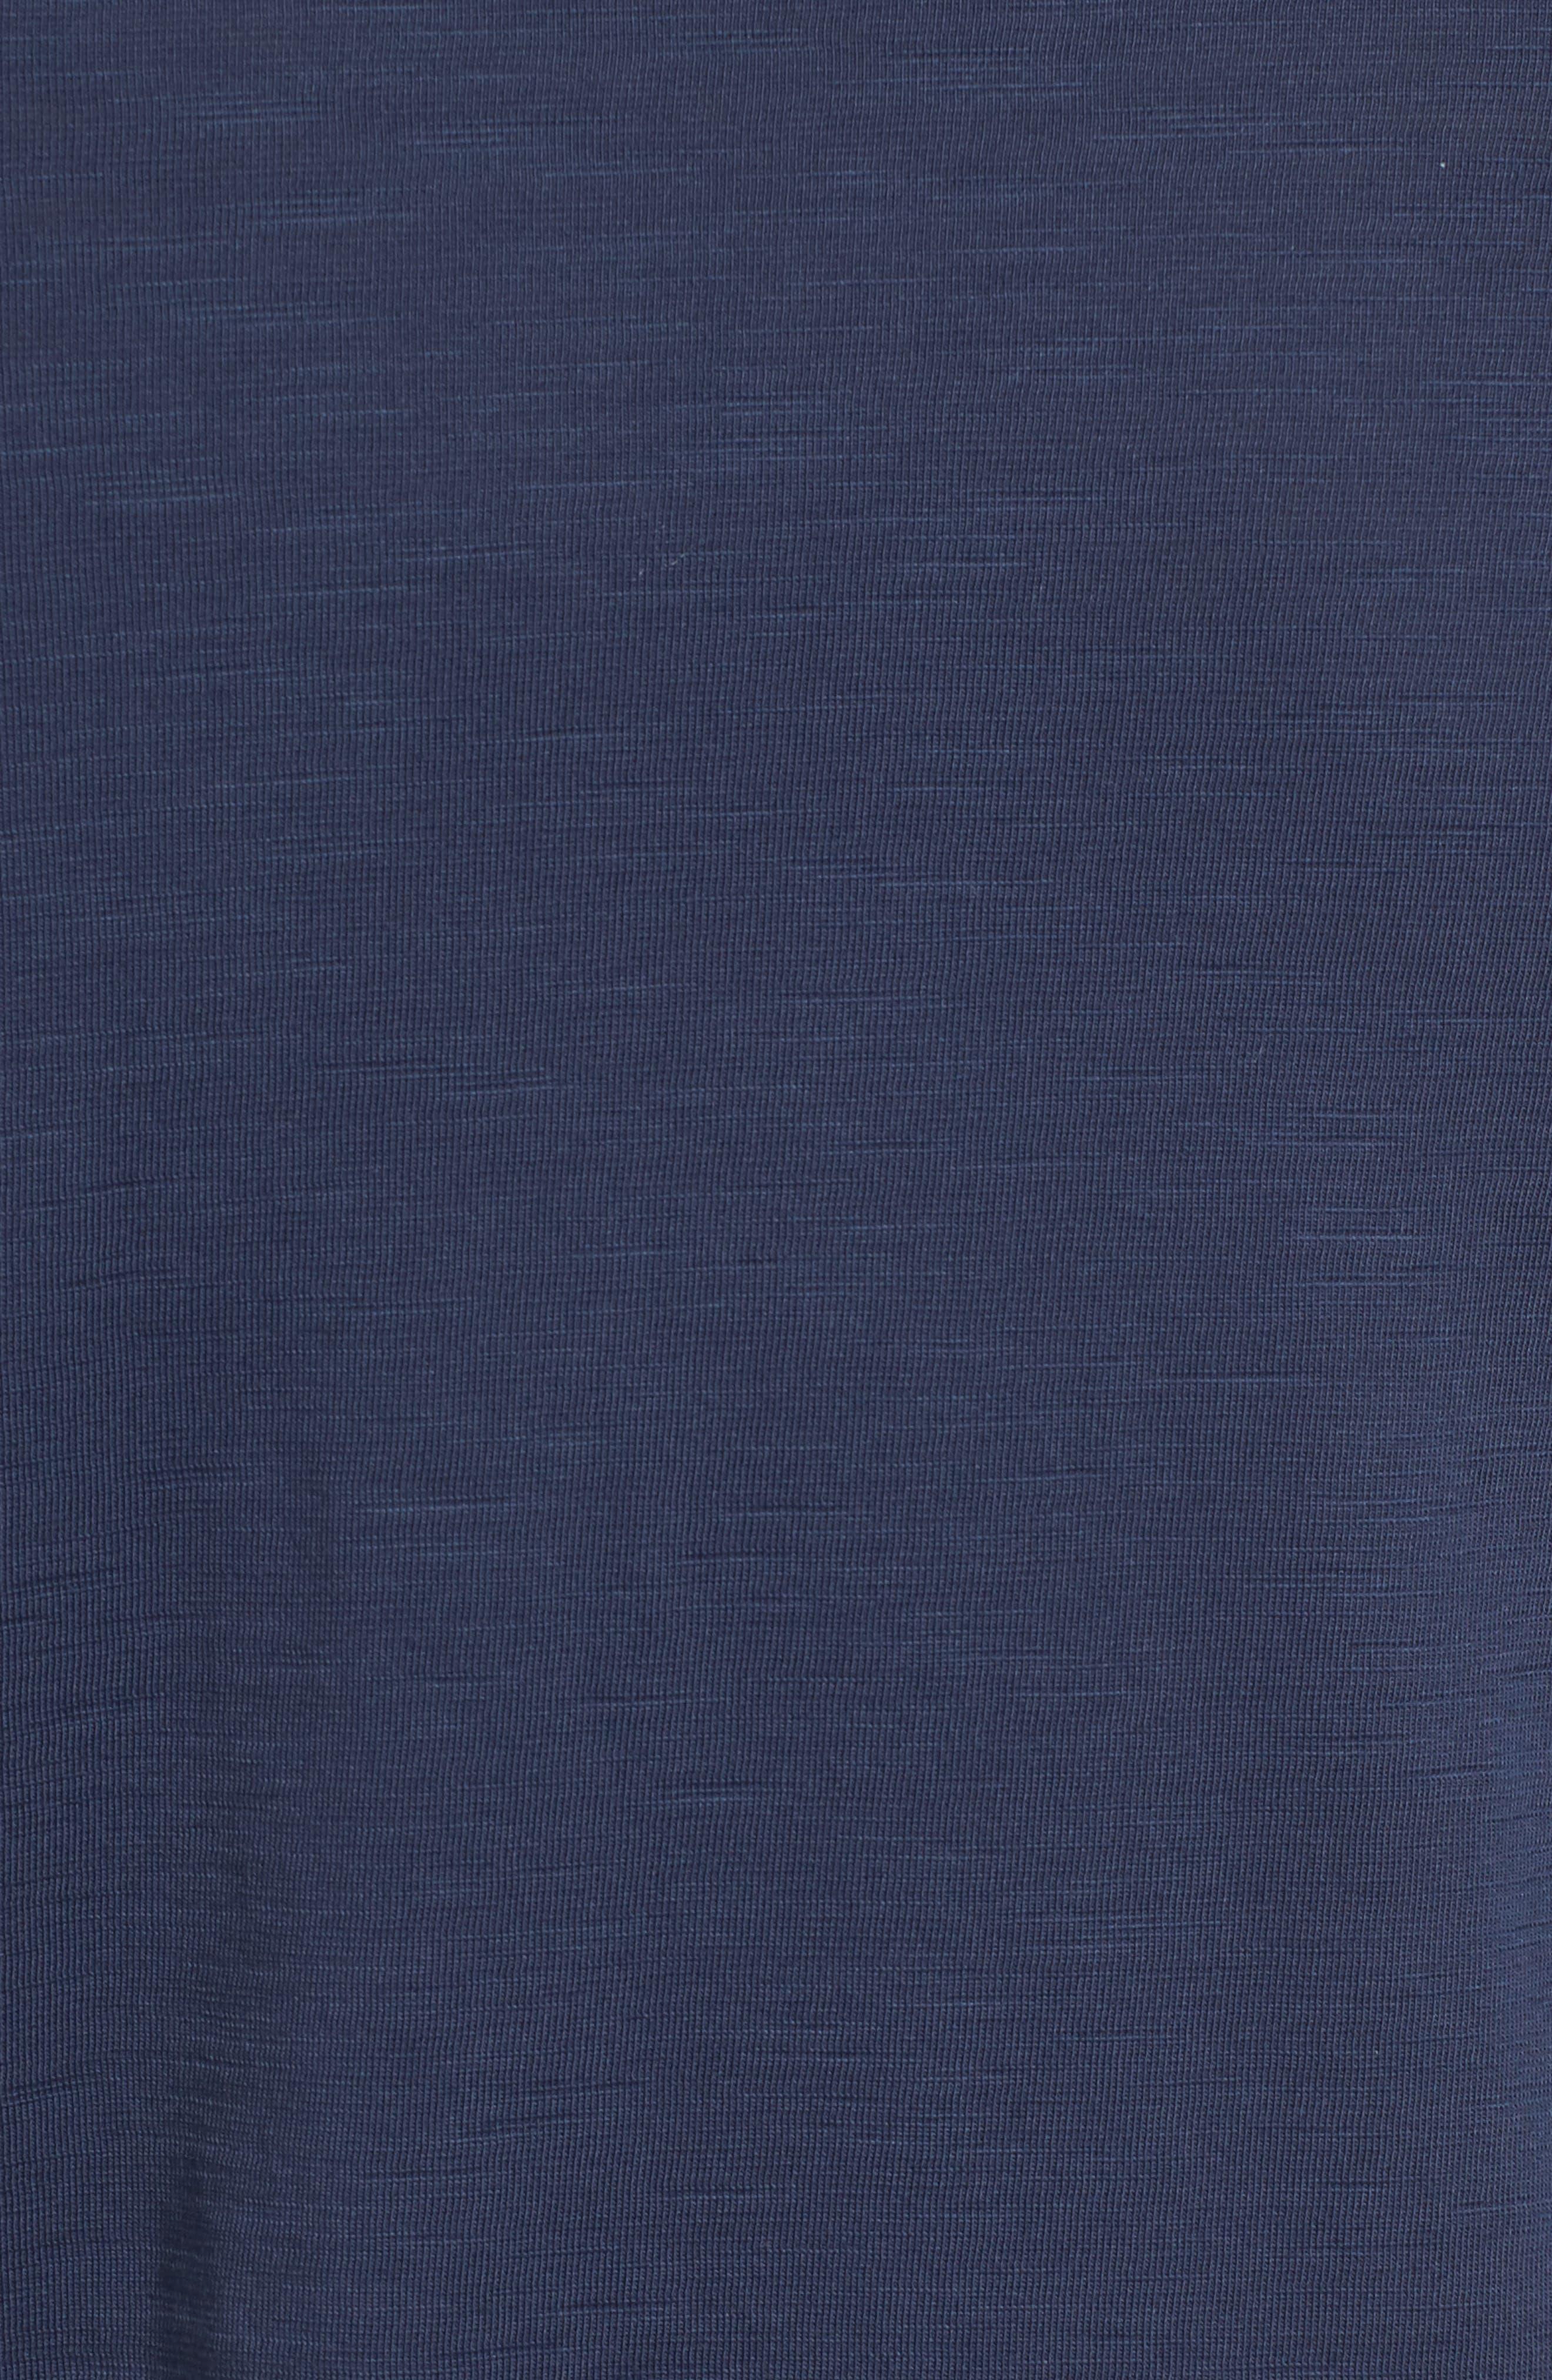 Portside Palms V-Neck T-Shirt,                             Alternate thumbnail 44, color,